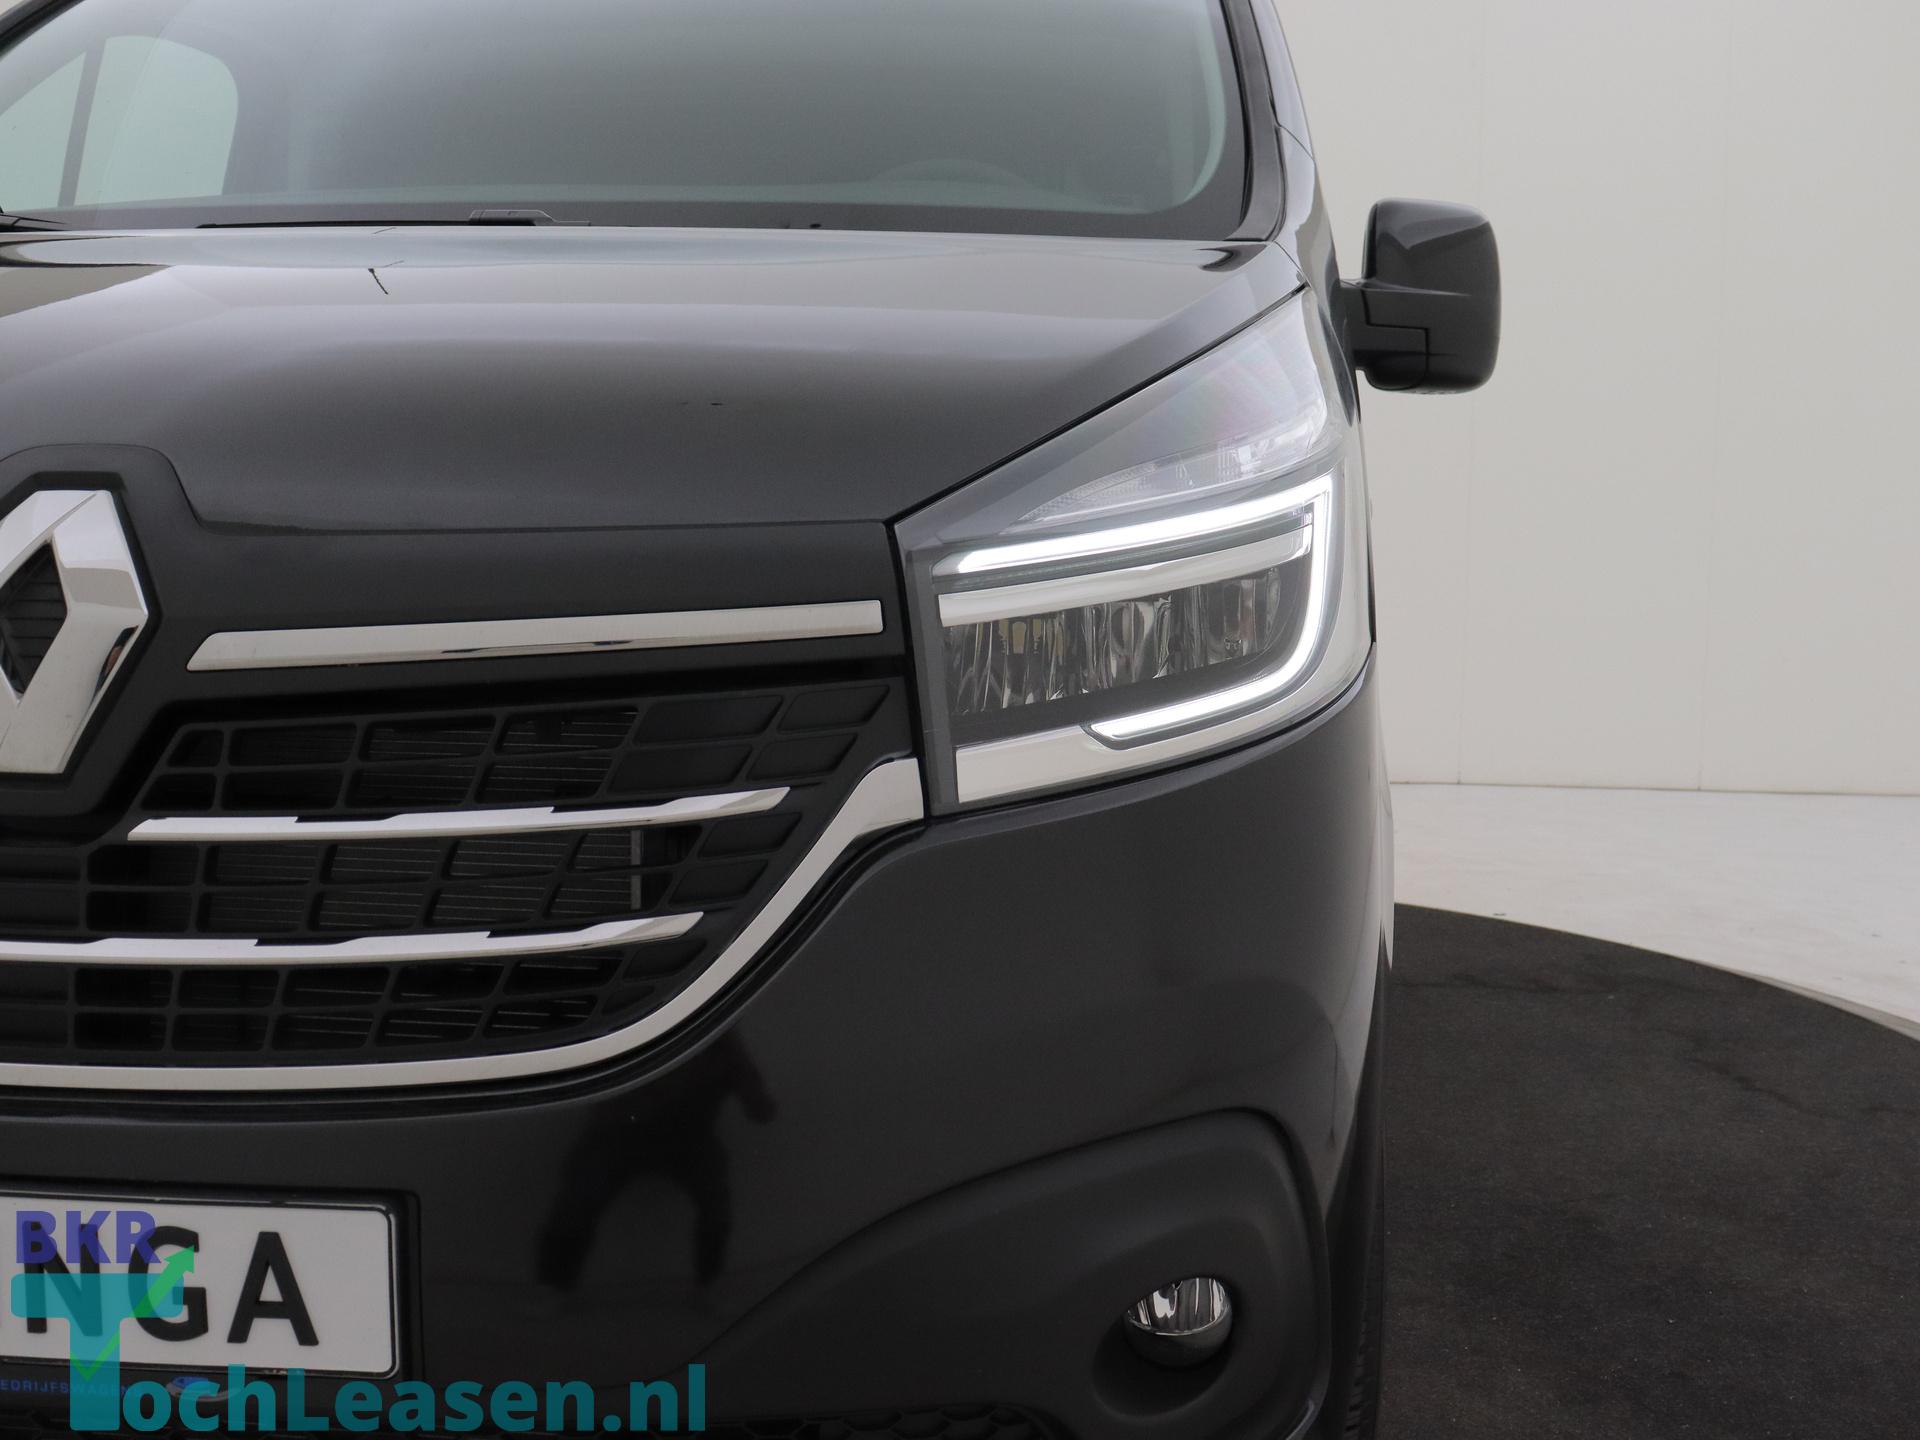 BKRTochLeasen.nl - Renault Trafic - K-Edtion 18